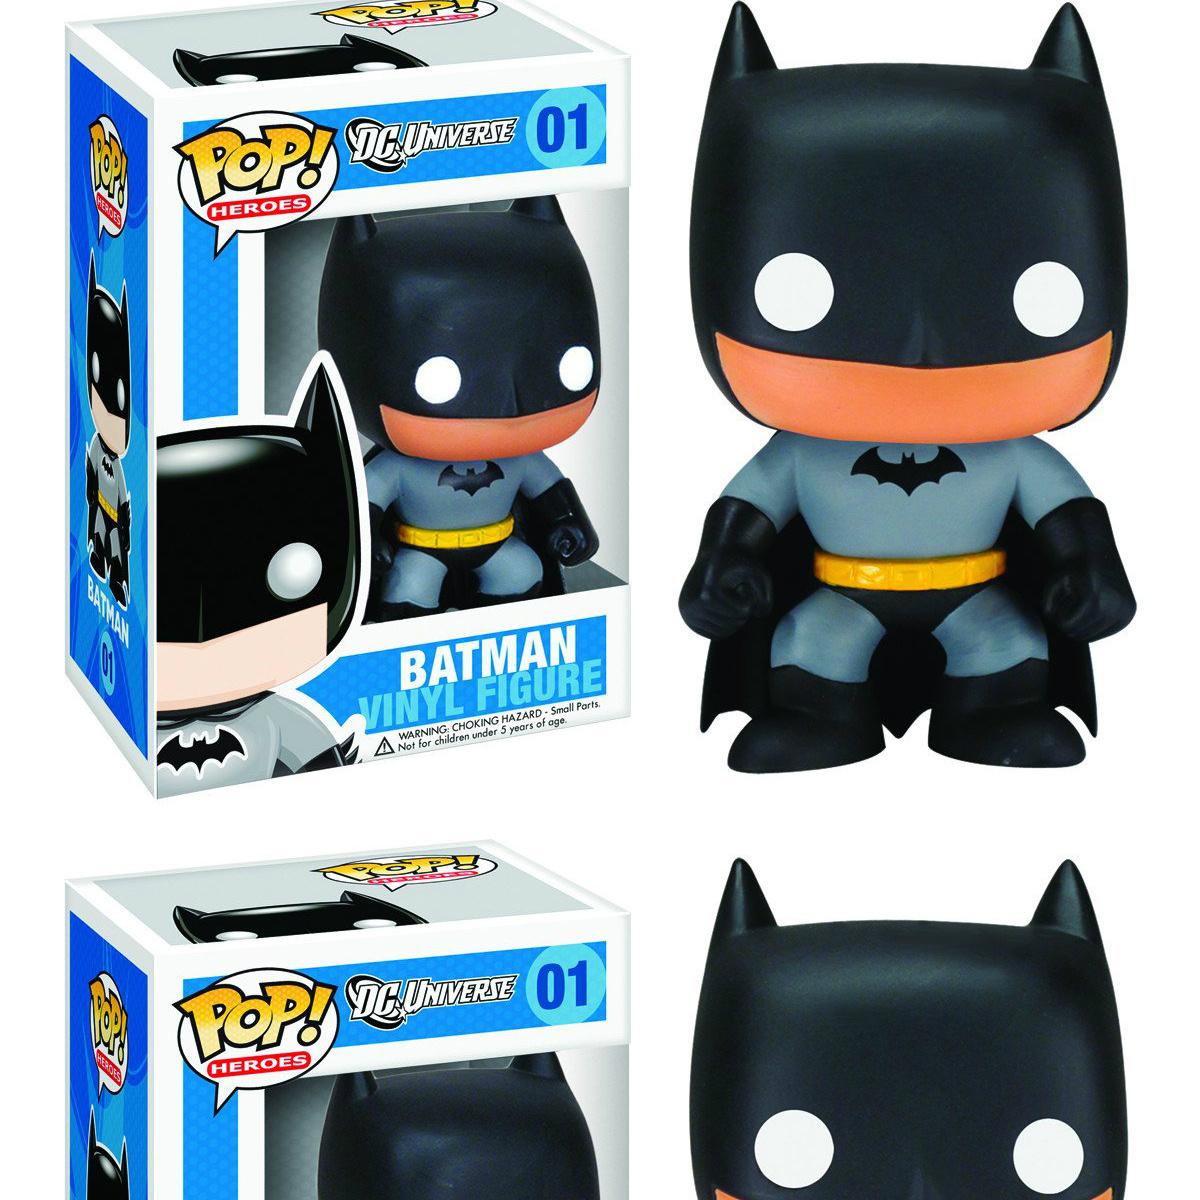 DC Heroes Classic Batman #144 Vinyl Figure Bundled with Pop Box Protector Case Funko Pop